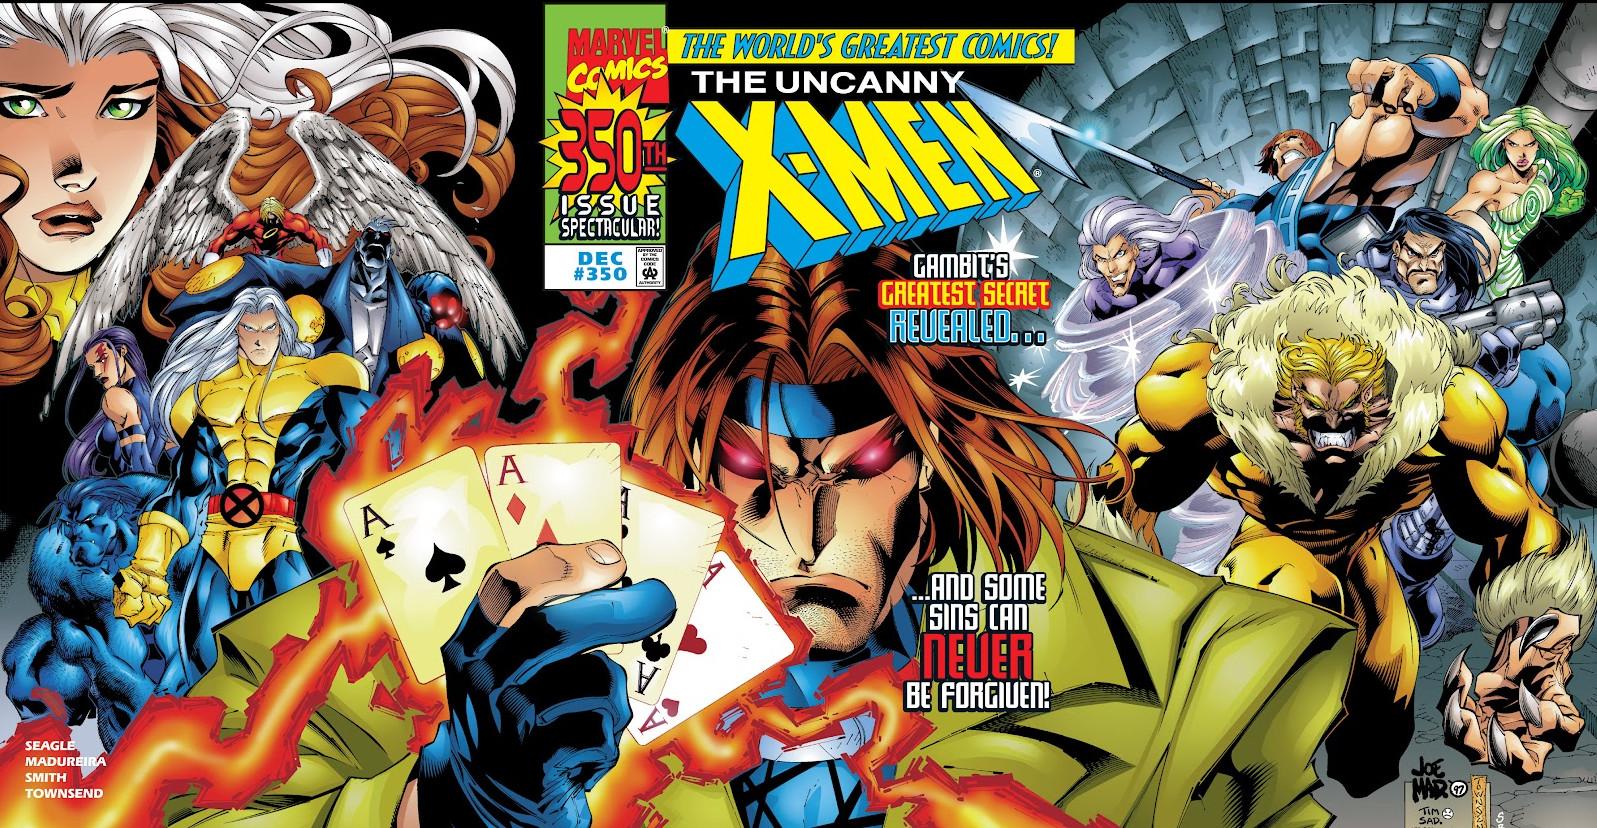 Uncanny X-Men Vol 1 350 Full Cover.jpg